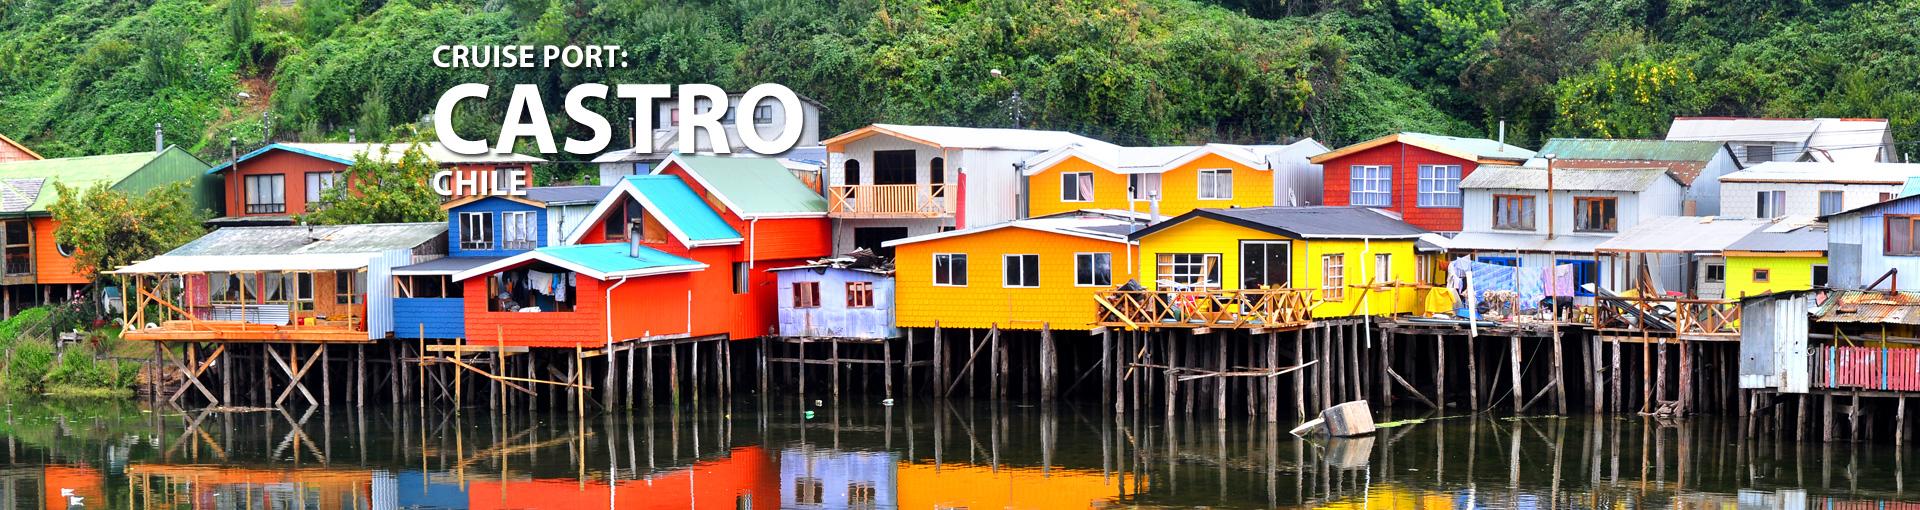 castro-chile-cruise-port-banner.jpg